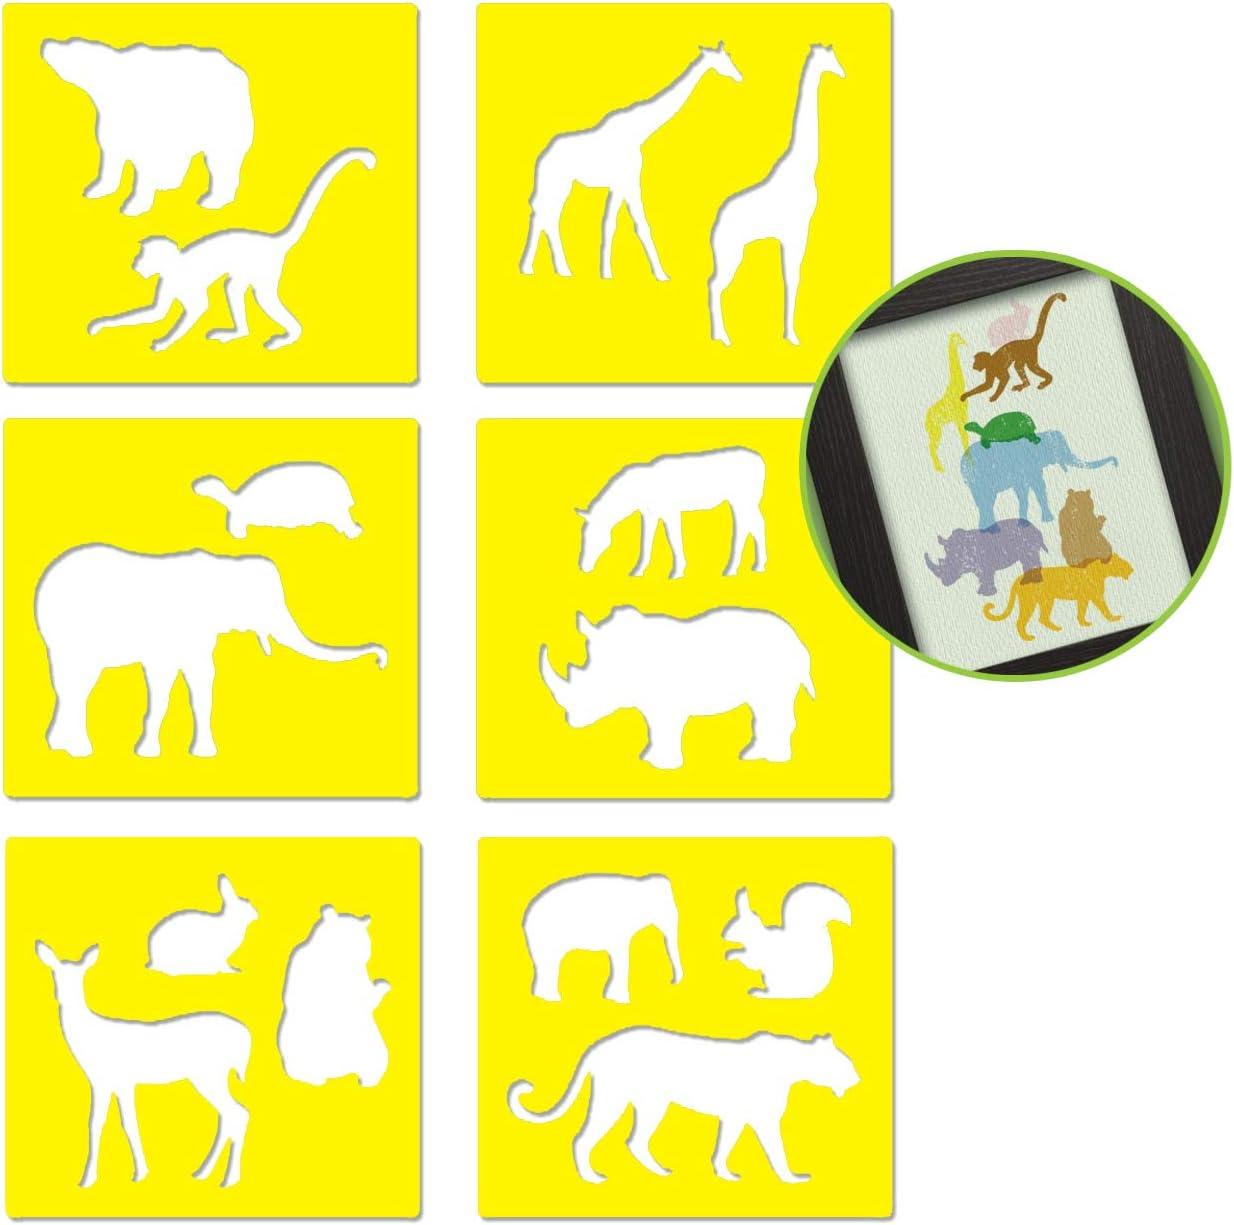 Stencils for Kids Children Plastic Drawing Painting Stencil Templates Tools Kits